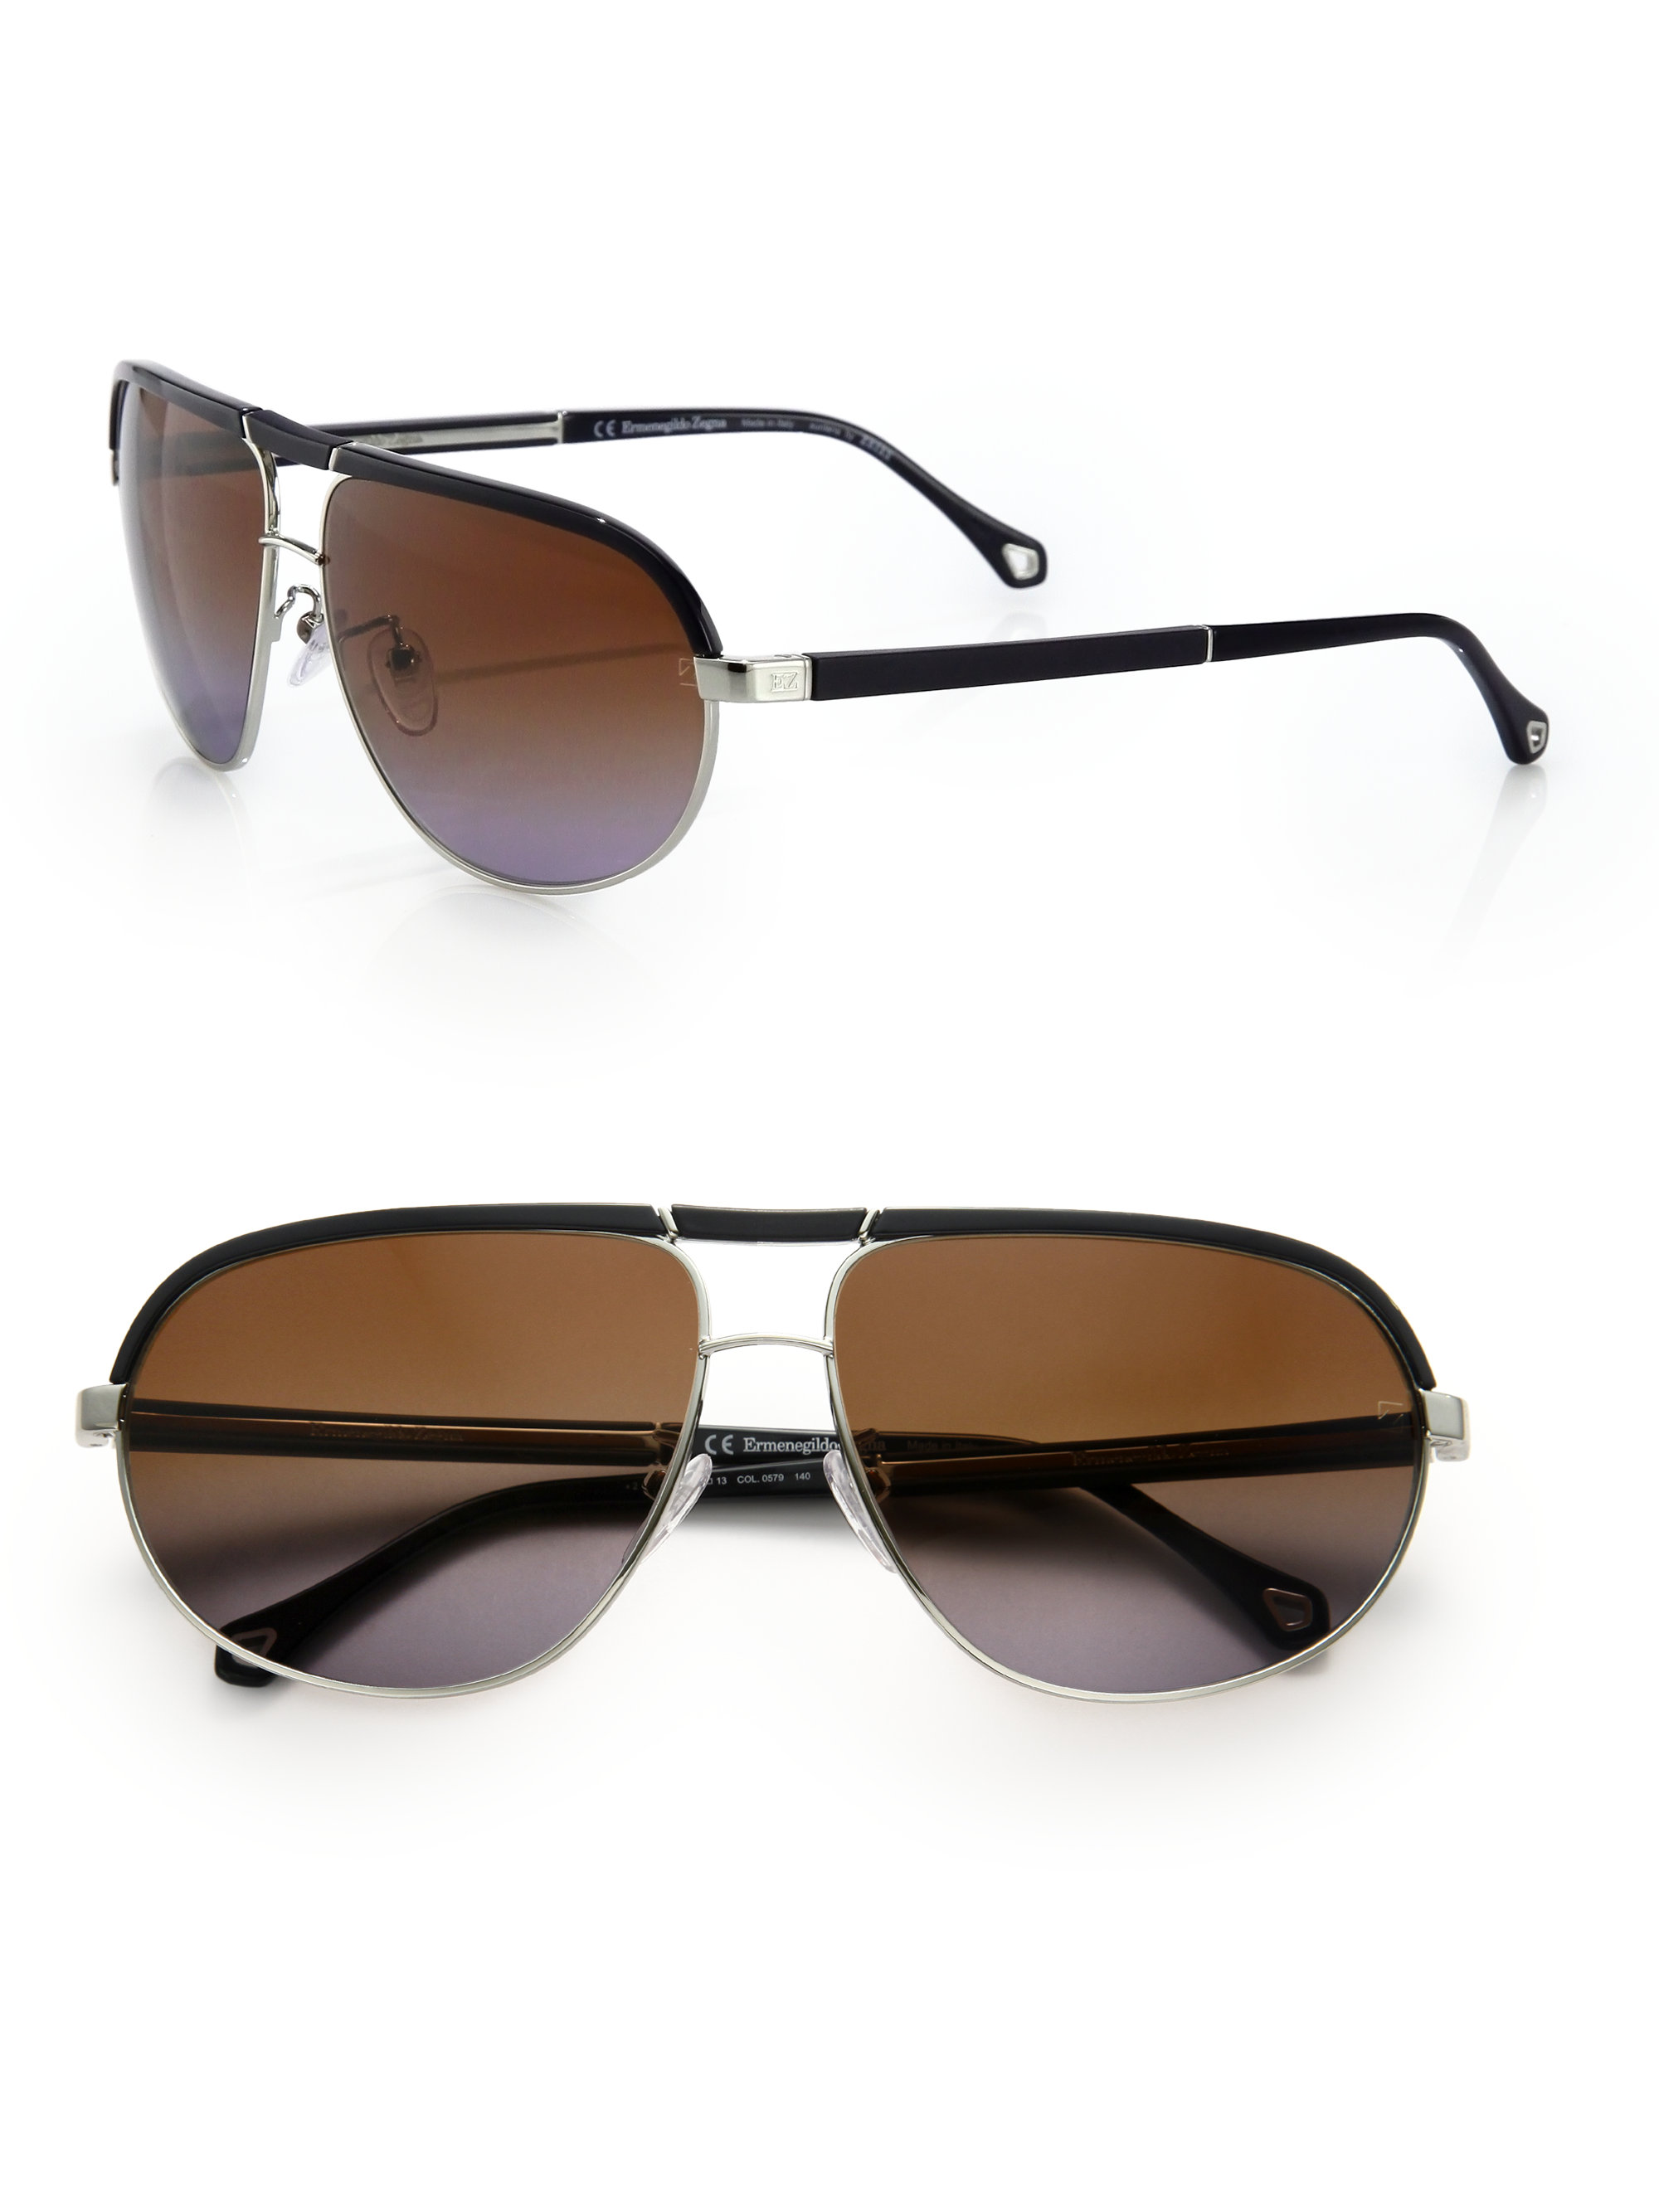 a1eb6d297e Ermenegildo zegna Navigator Sunglasses in Brown for Men